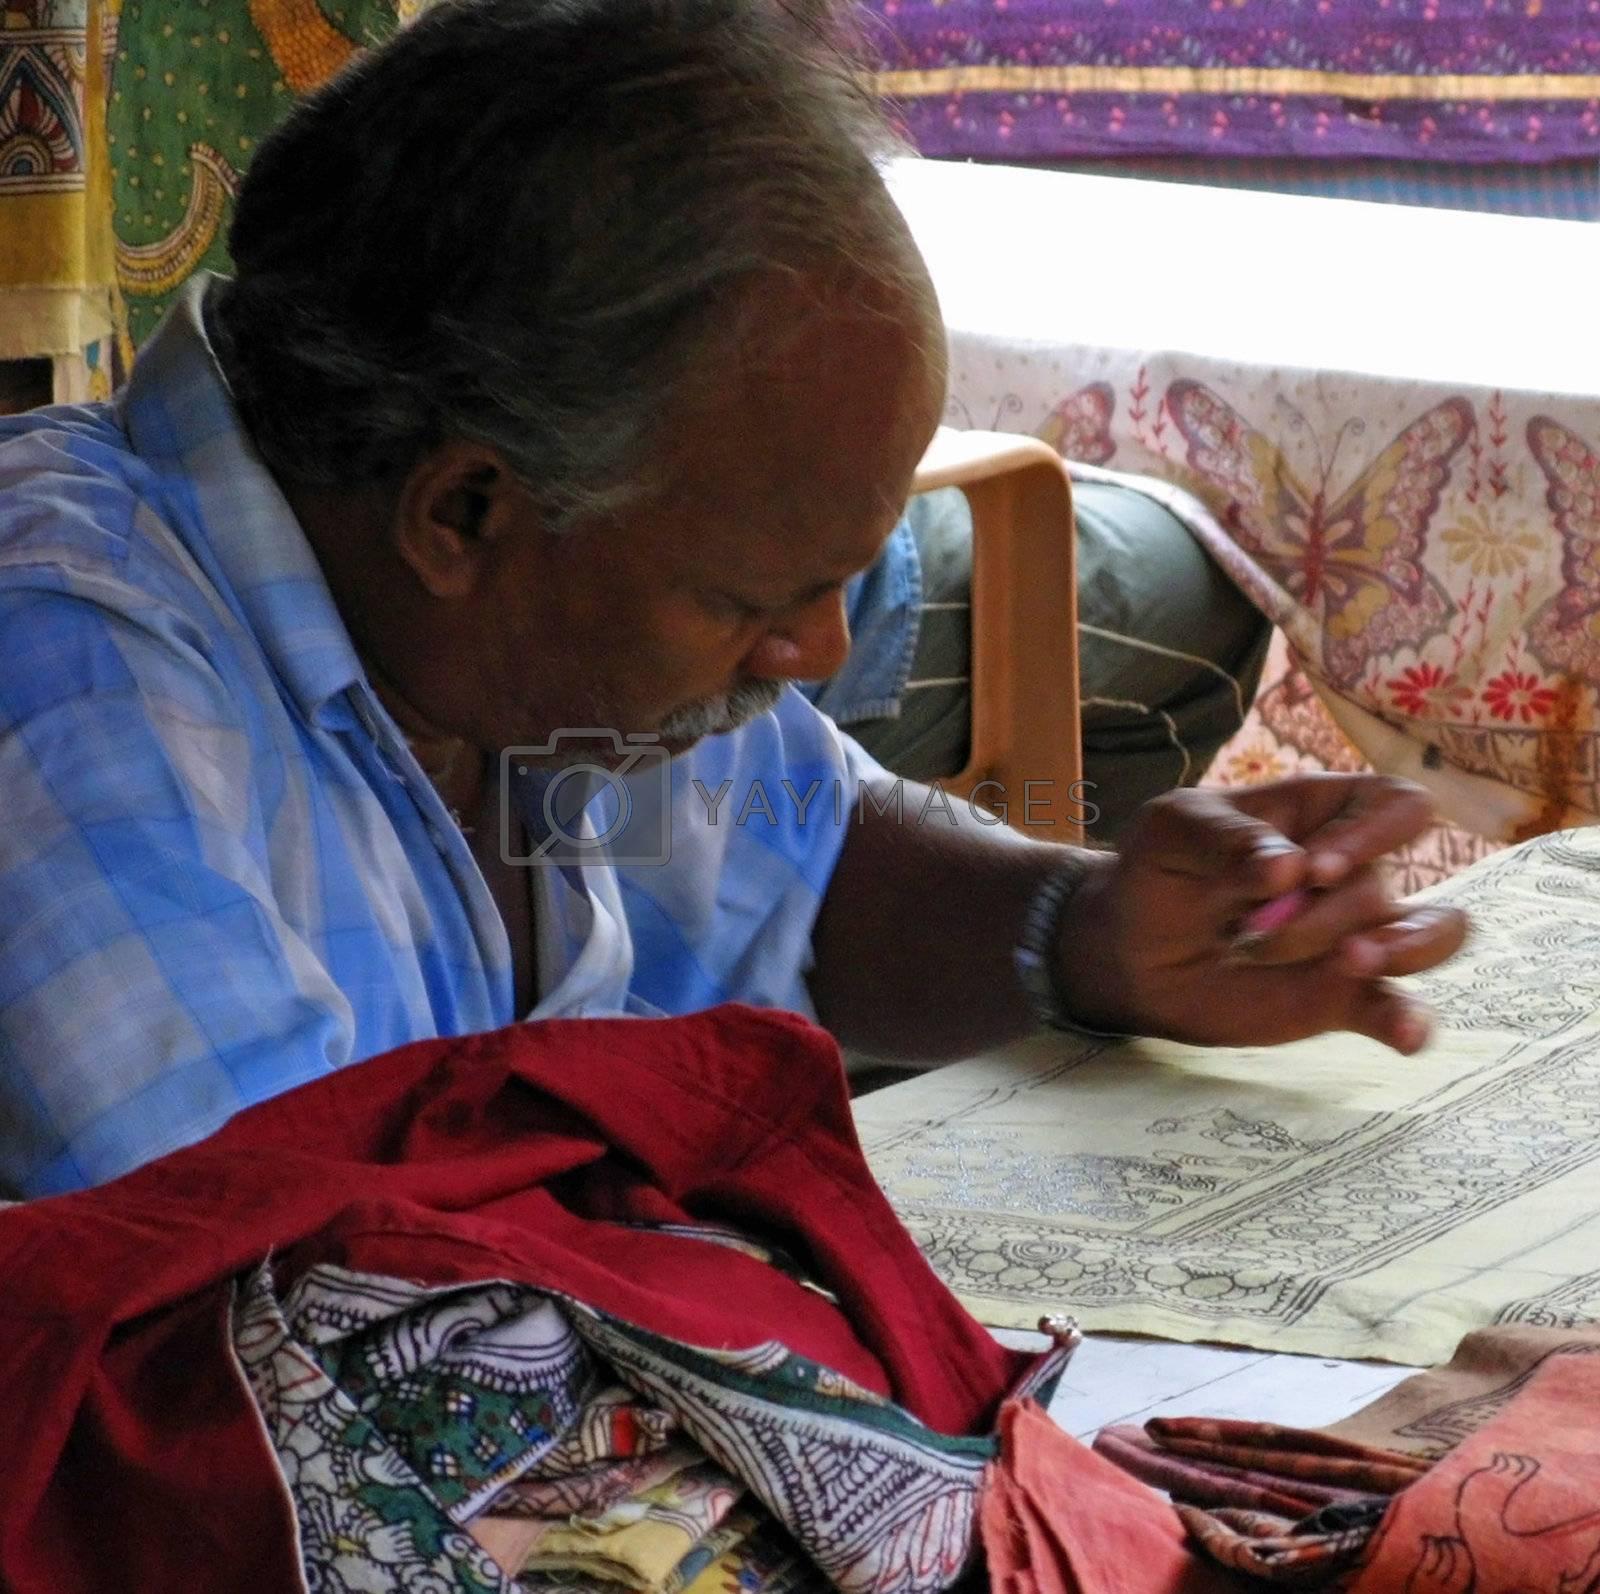 An elderly artist in India creates cloth artwork.